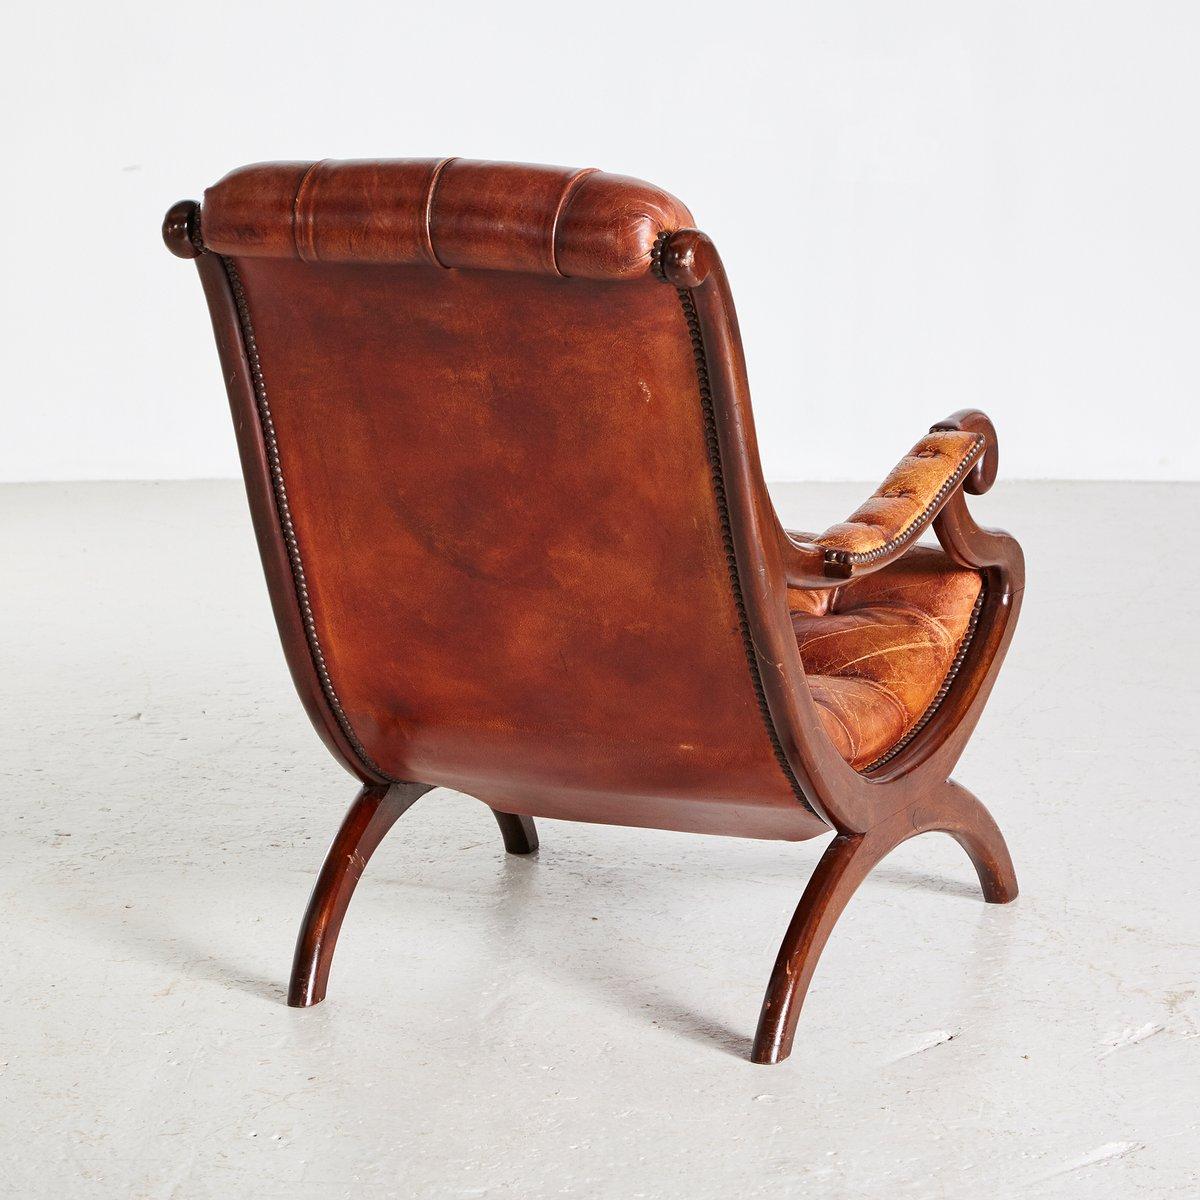 fauteuil chesterfield en cuir marron 1970s en vente sur. Black Bedroom Furniture Sets. Home Design Ideas